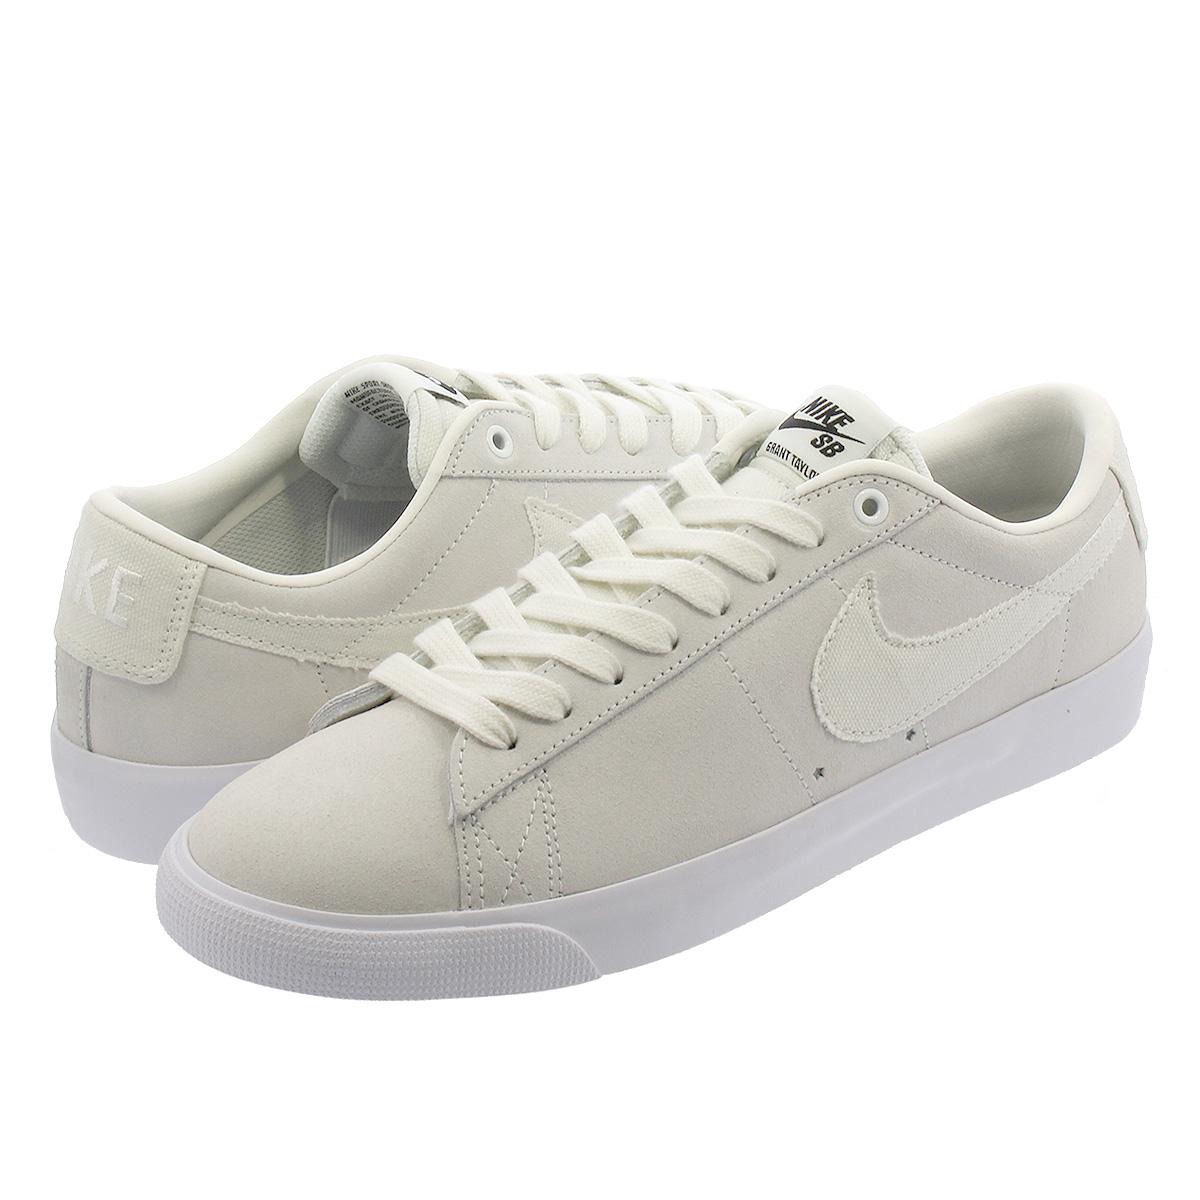 online store 0b93d 4c853 NIKE SB BLAZER LOW GT Nike SB blazer low GT SUMMIT WHITE/OBSIDIAN/GUM  YELLOW 704,939-100